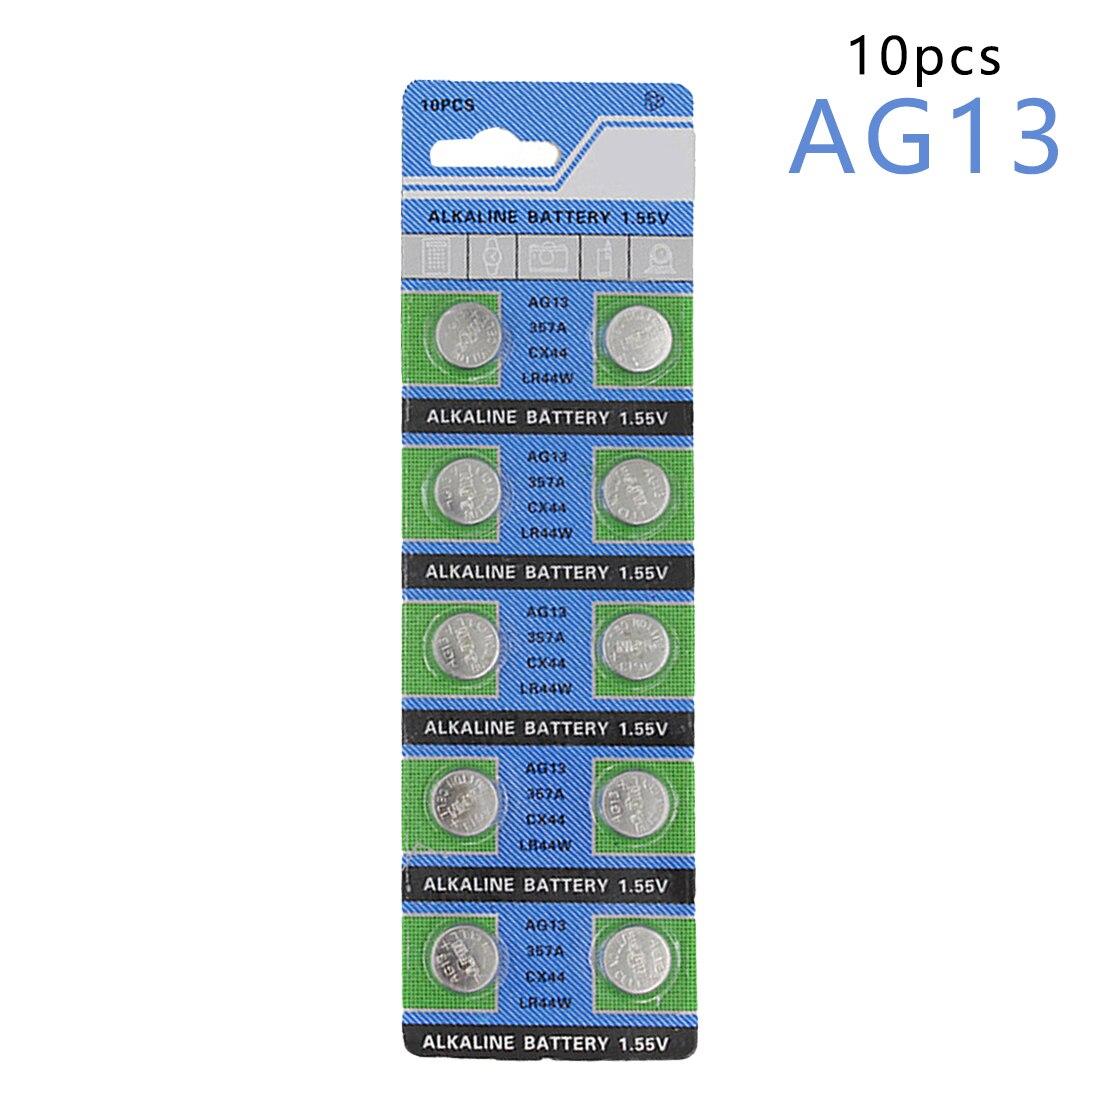 цена на Centechia Good Sale 10 Pcs AG13 LR44 357A S76E G13 Button Coin Cell Battery Batteries 1.55V Alkaline